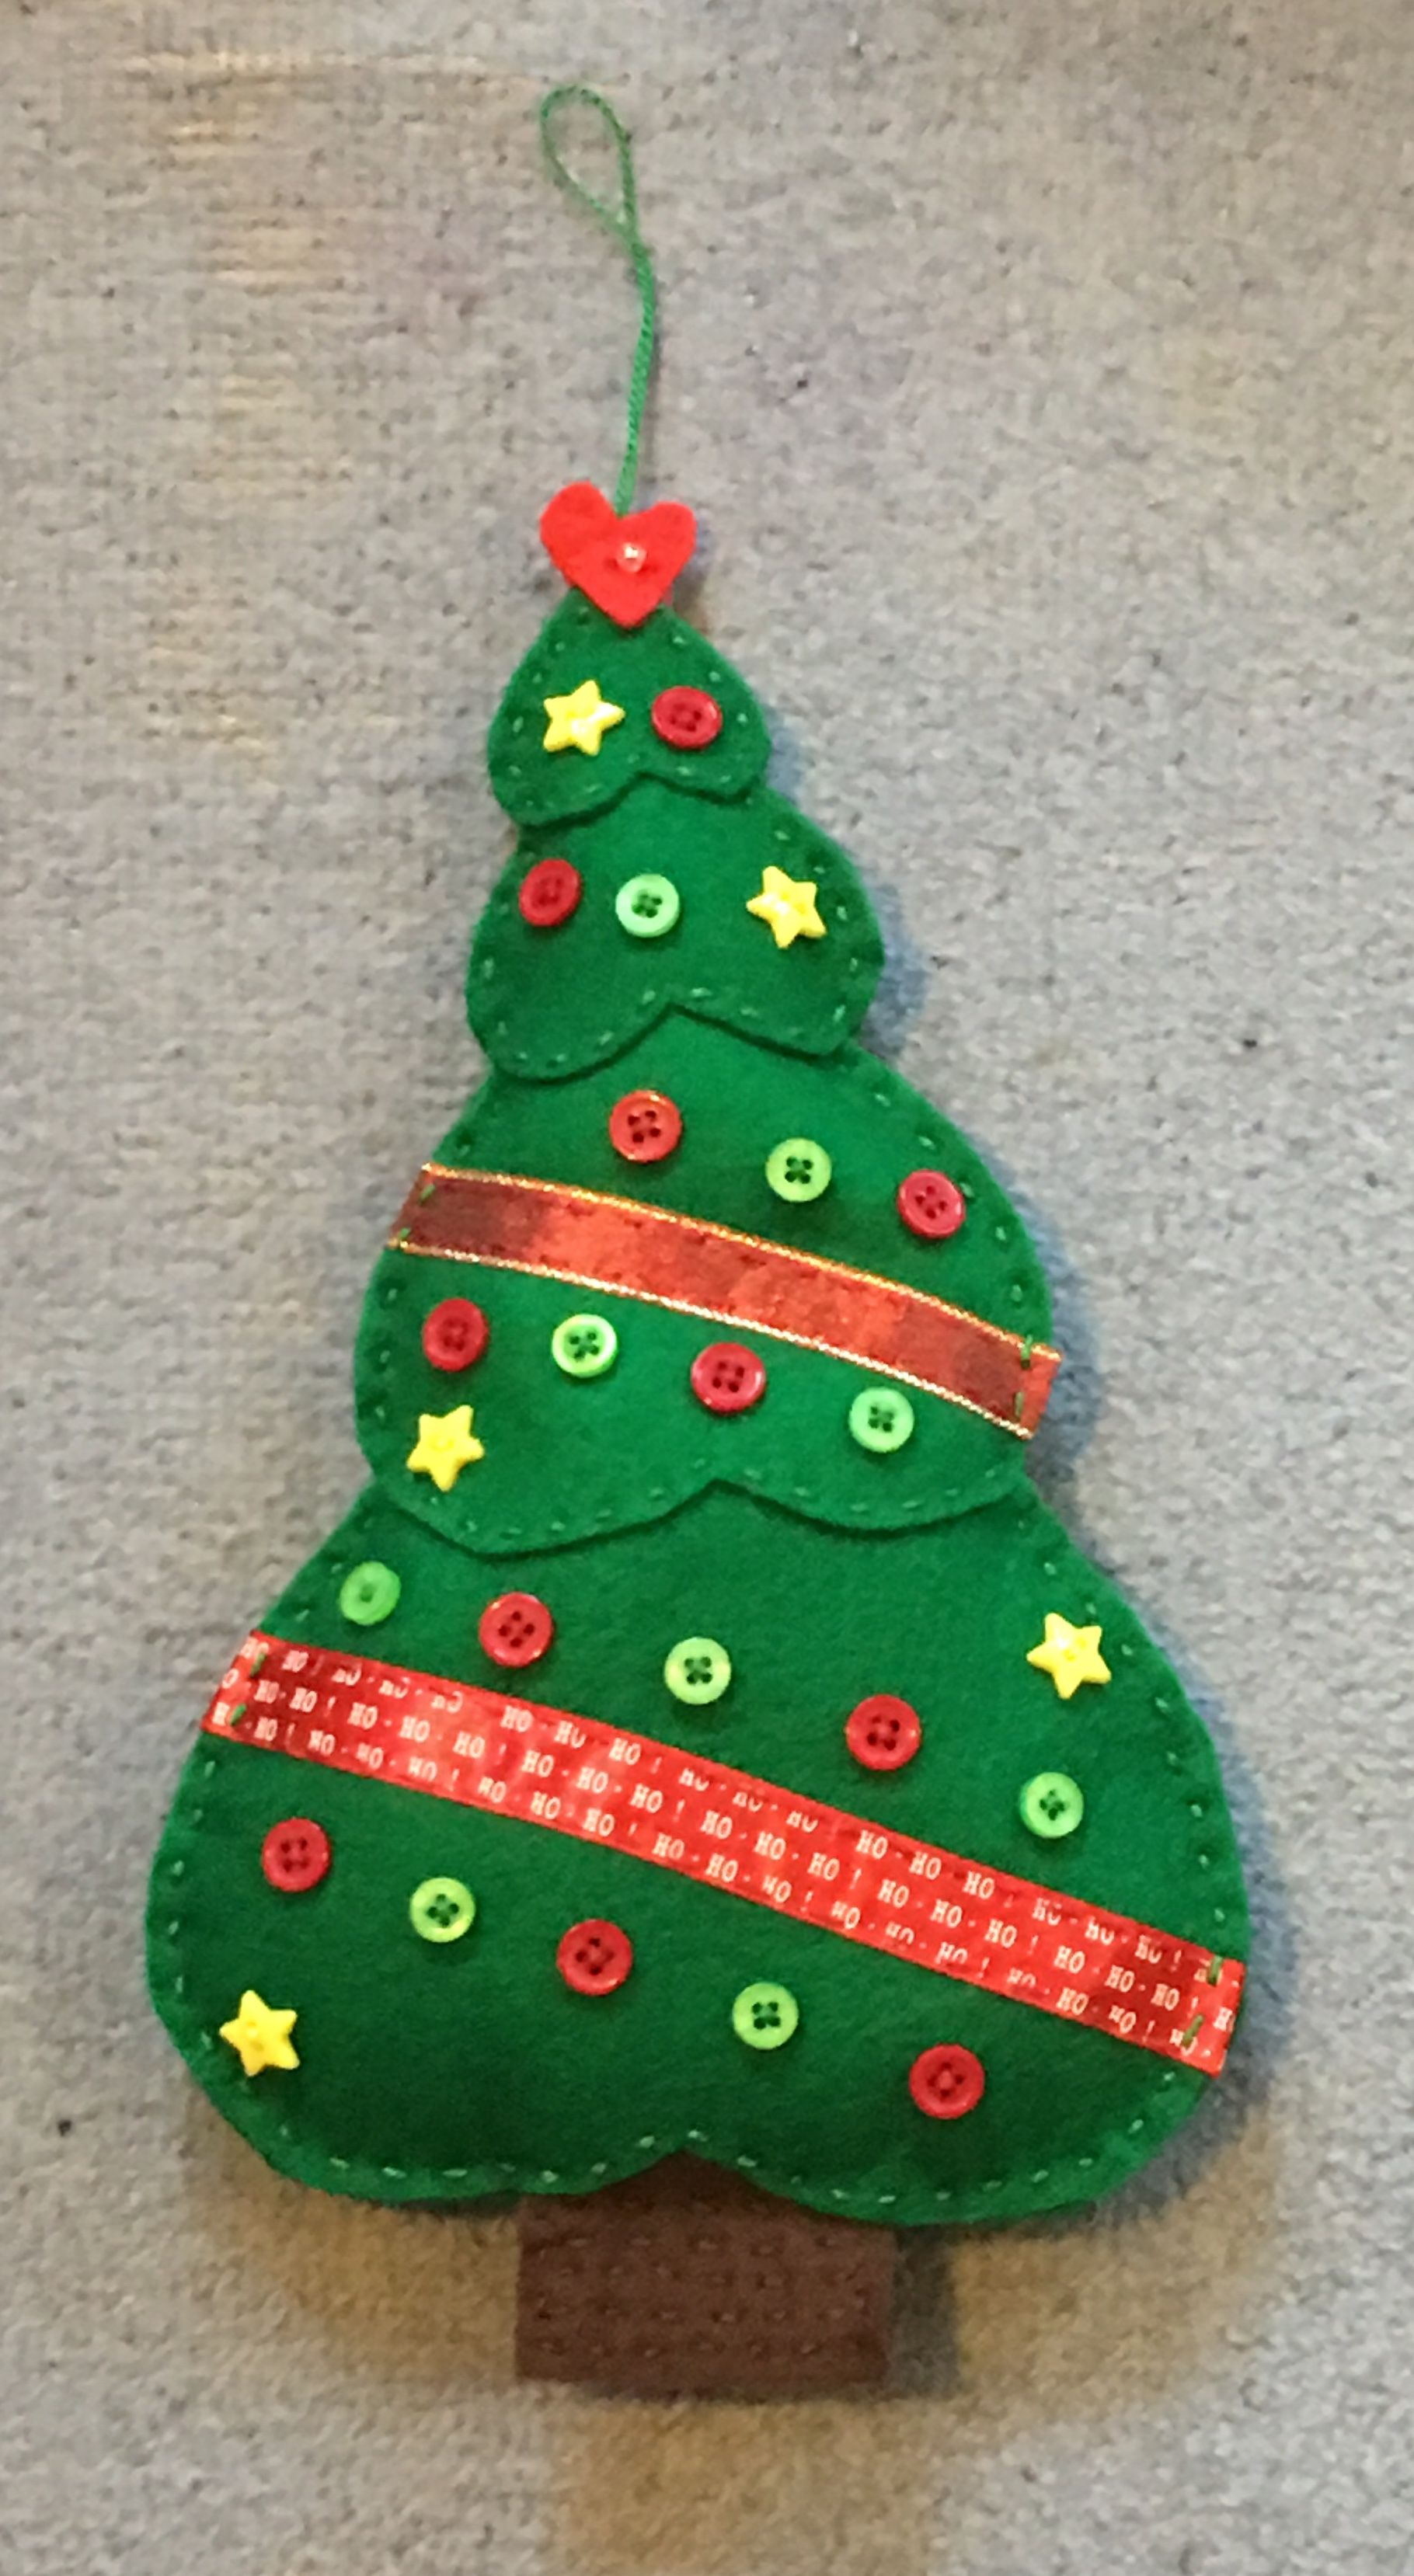 Christmas Tree In Felt Fabric Christmas Ornaments Felt Crafts Christmas Felt Christmas Ornaments